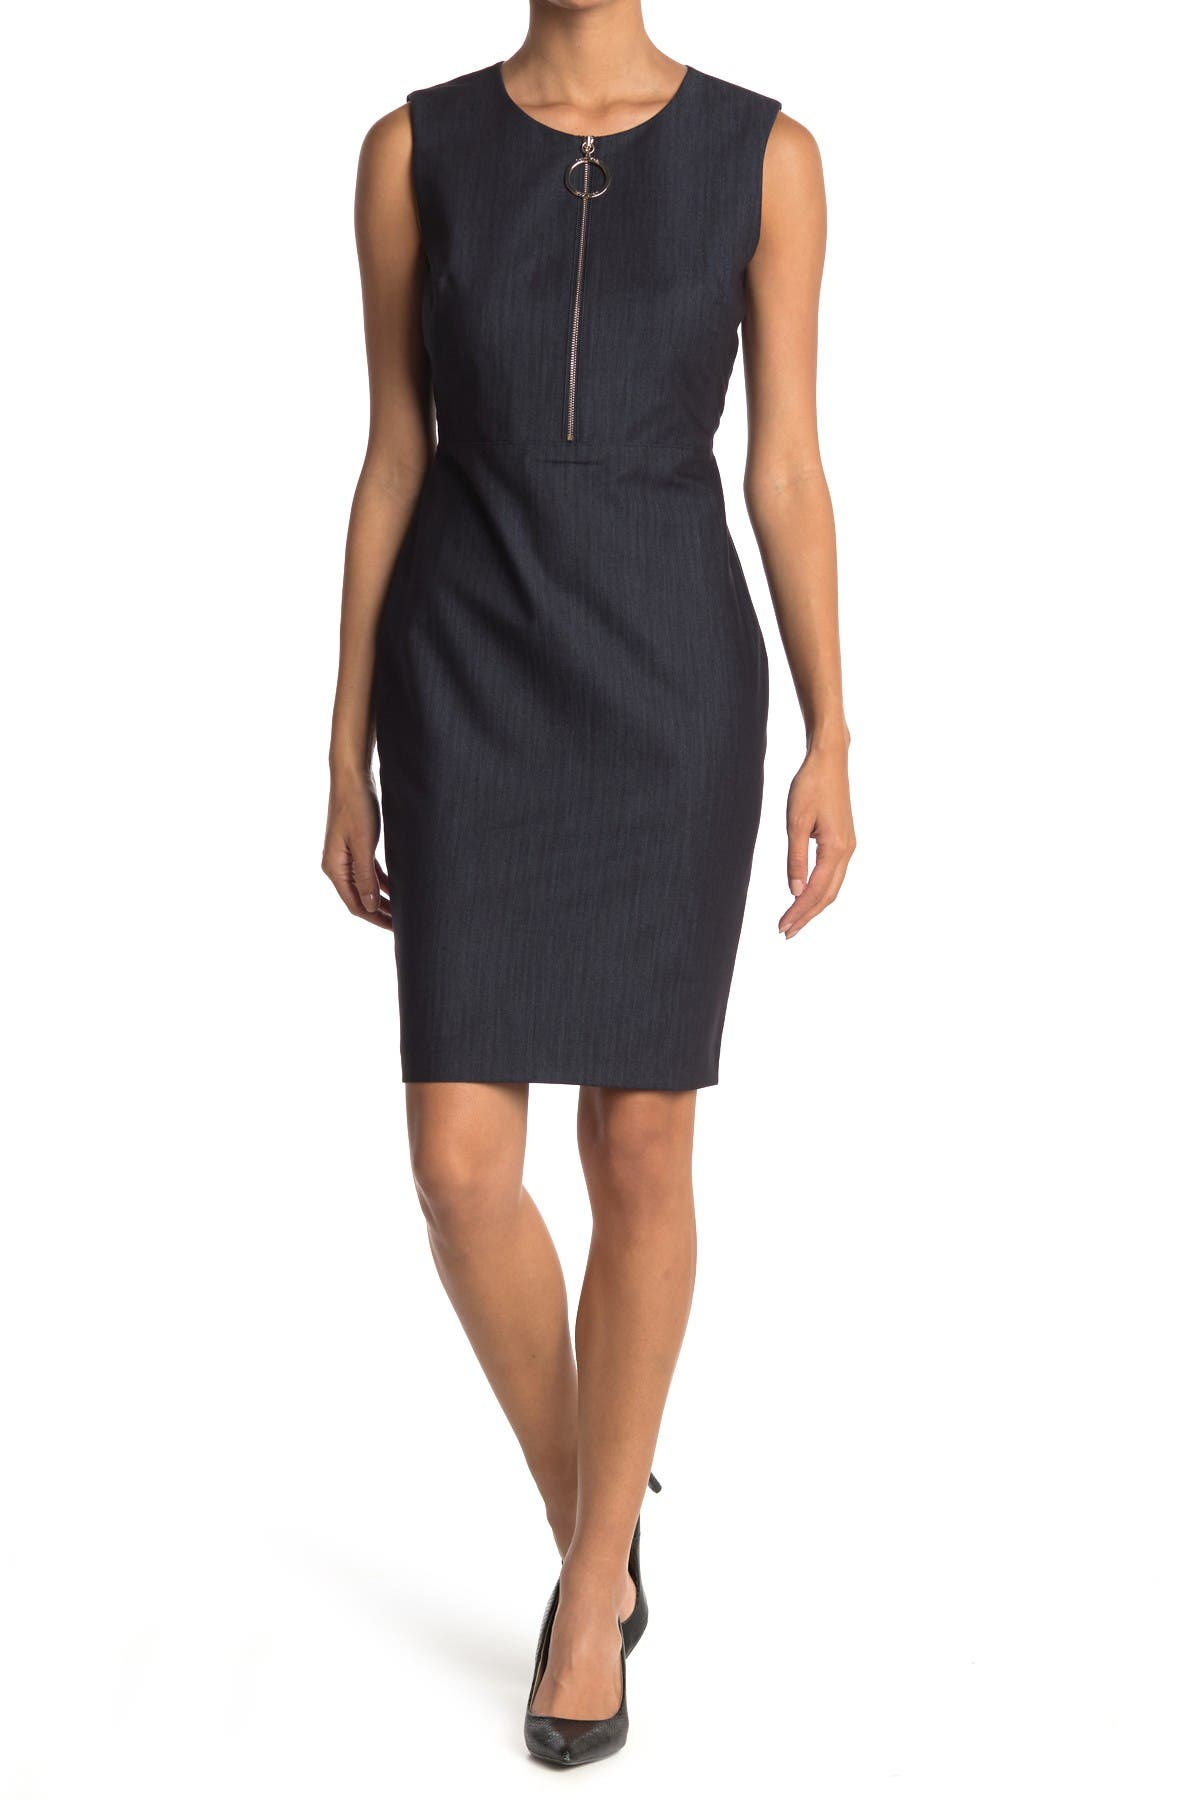 Image of Calvin Klein Sleeveless Denim Zip Front Sheath Dress